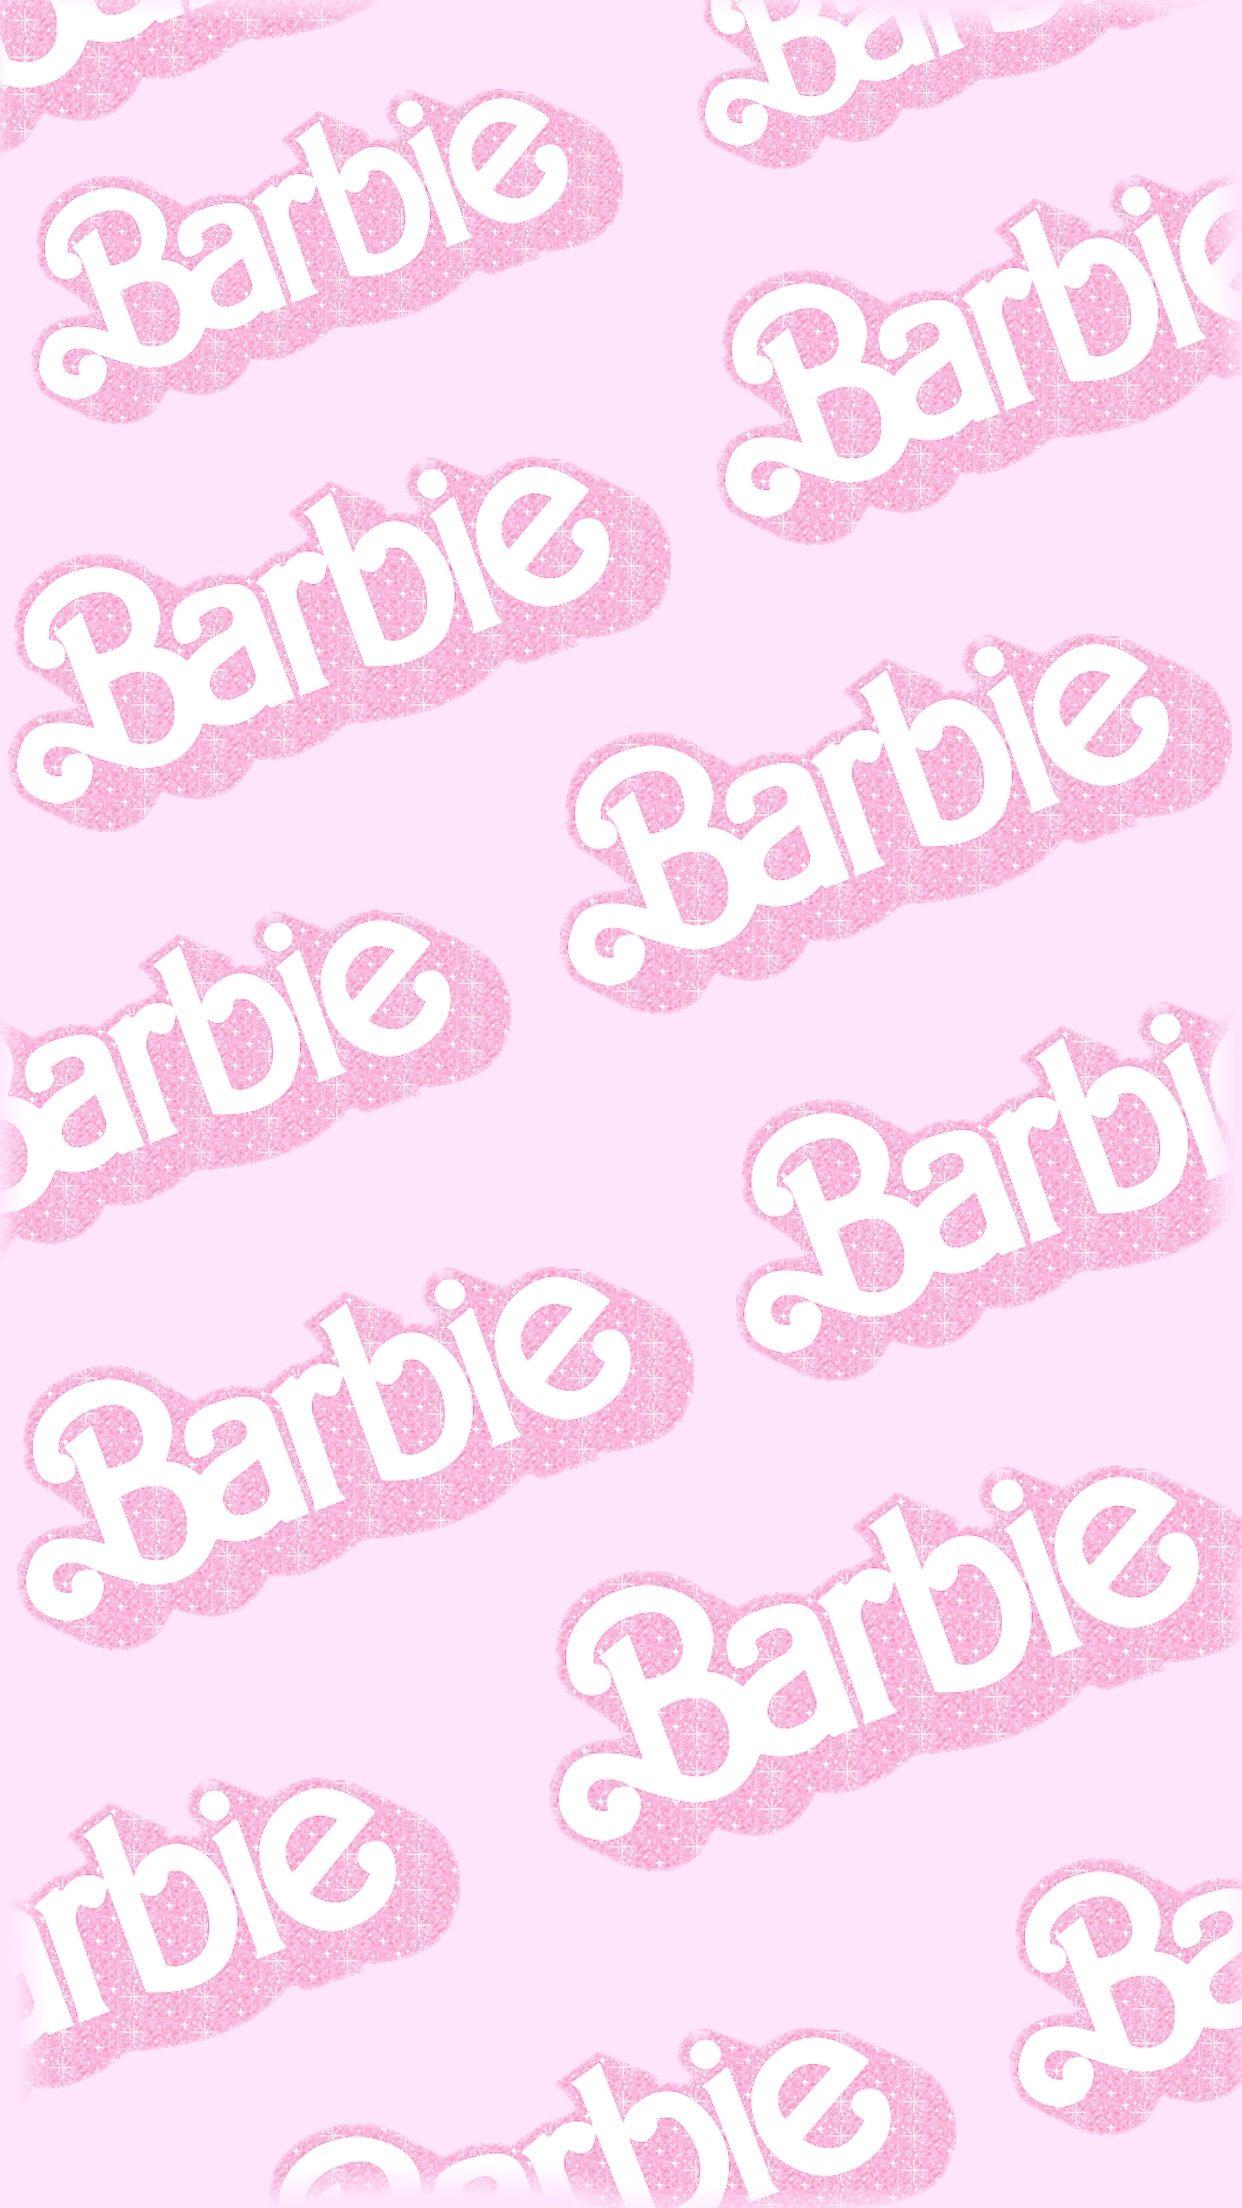 Barbie Aesthetic Wallpaper : barbie, aesthetic, wallpaper, Sutton, Backgrounds, Wallpaper, Iphone,, Iphone, Pattern,, Aesthetic